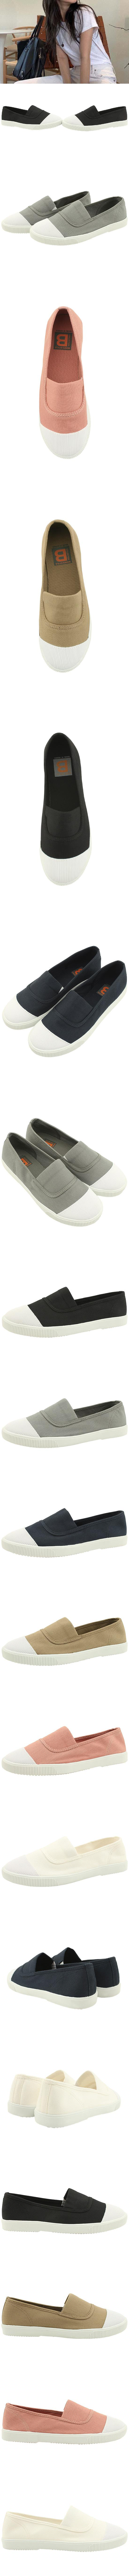 Canvas Shoes Cotton Slip-on Shoes White